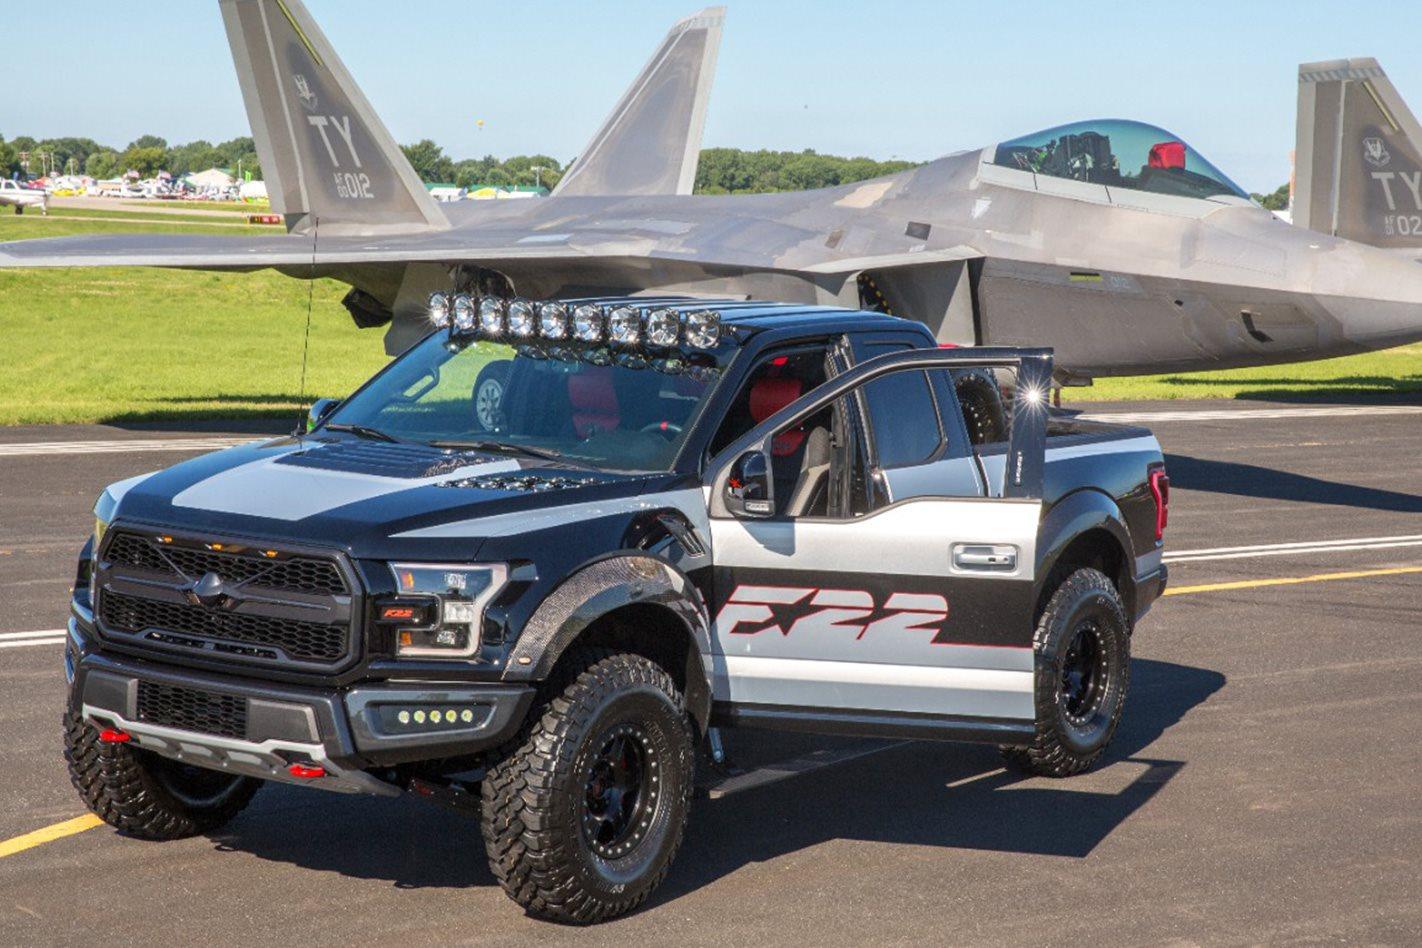 Custom Ford F150 Raptor inspired by Fighter Jet